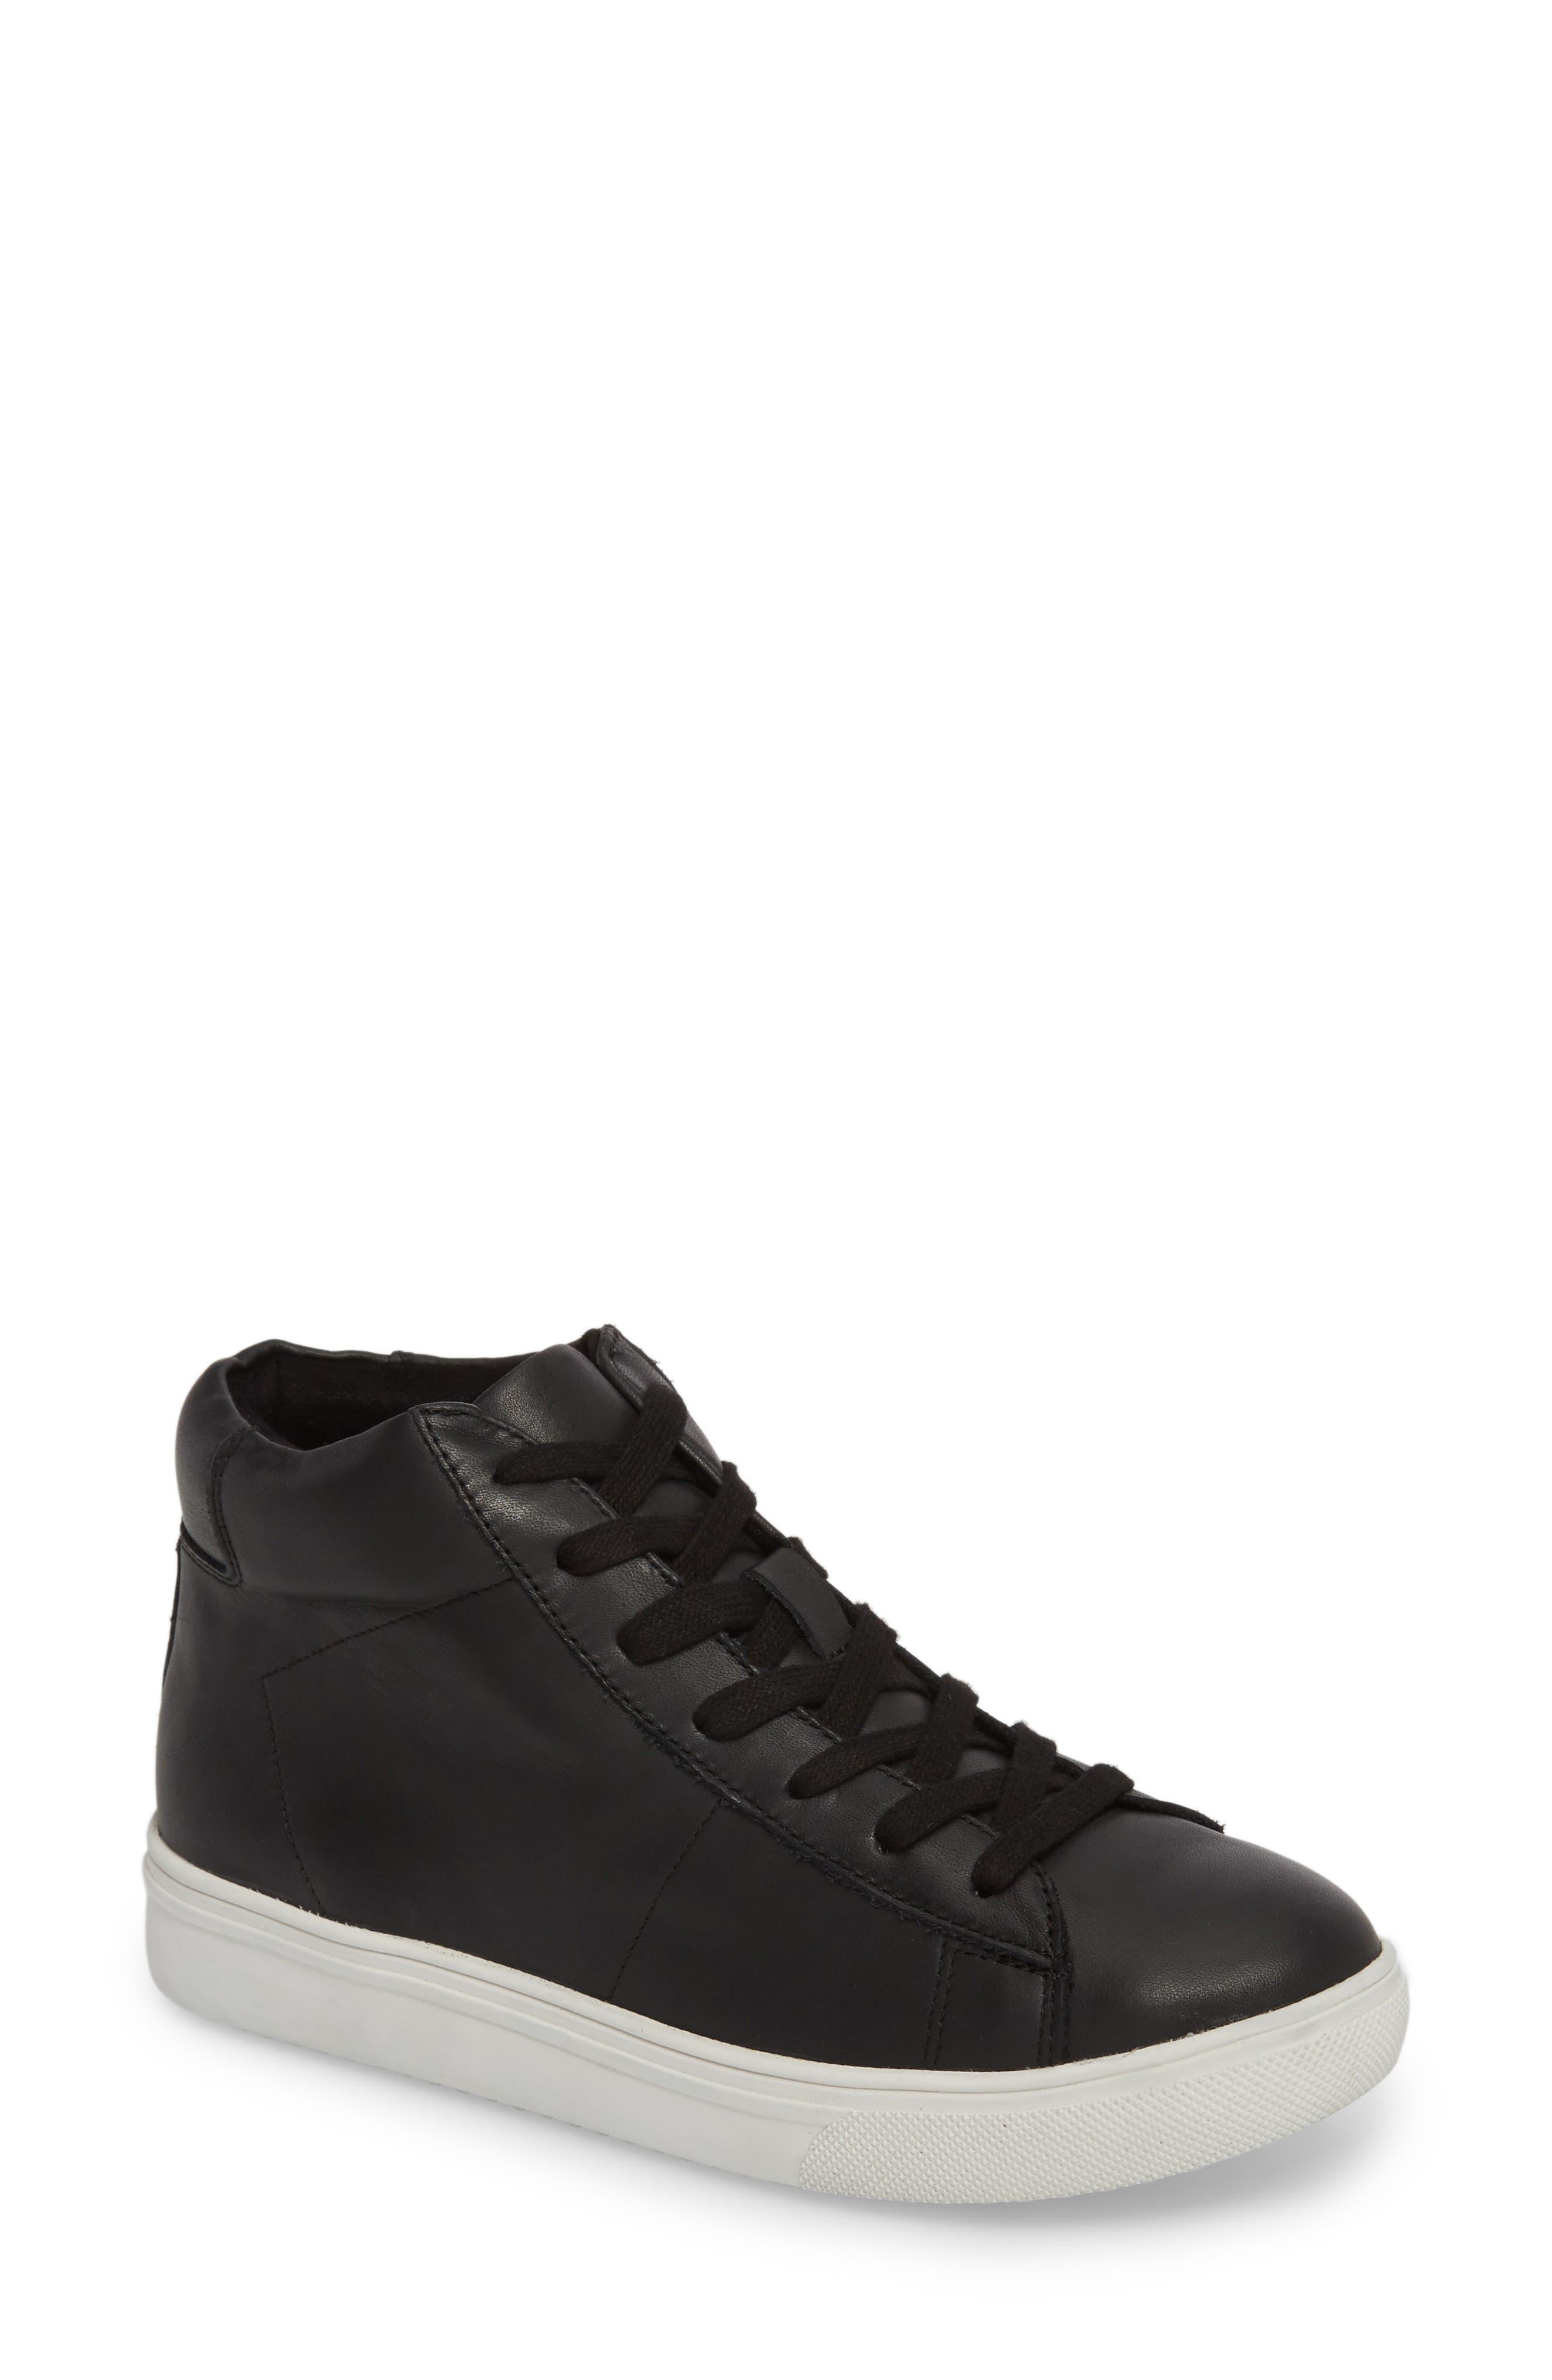 Jax Waterproof High Top Sneaker,                         Main,                         color,